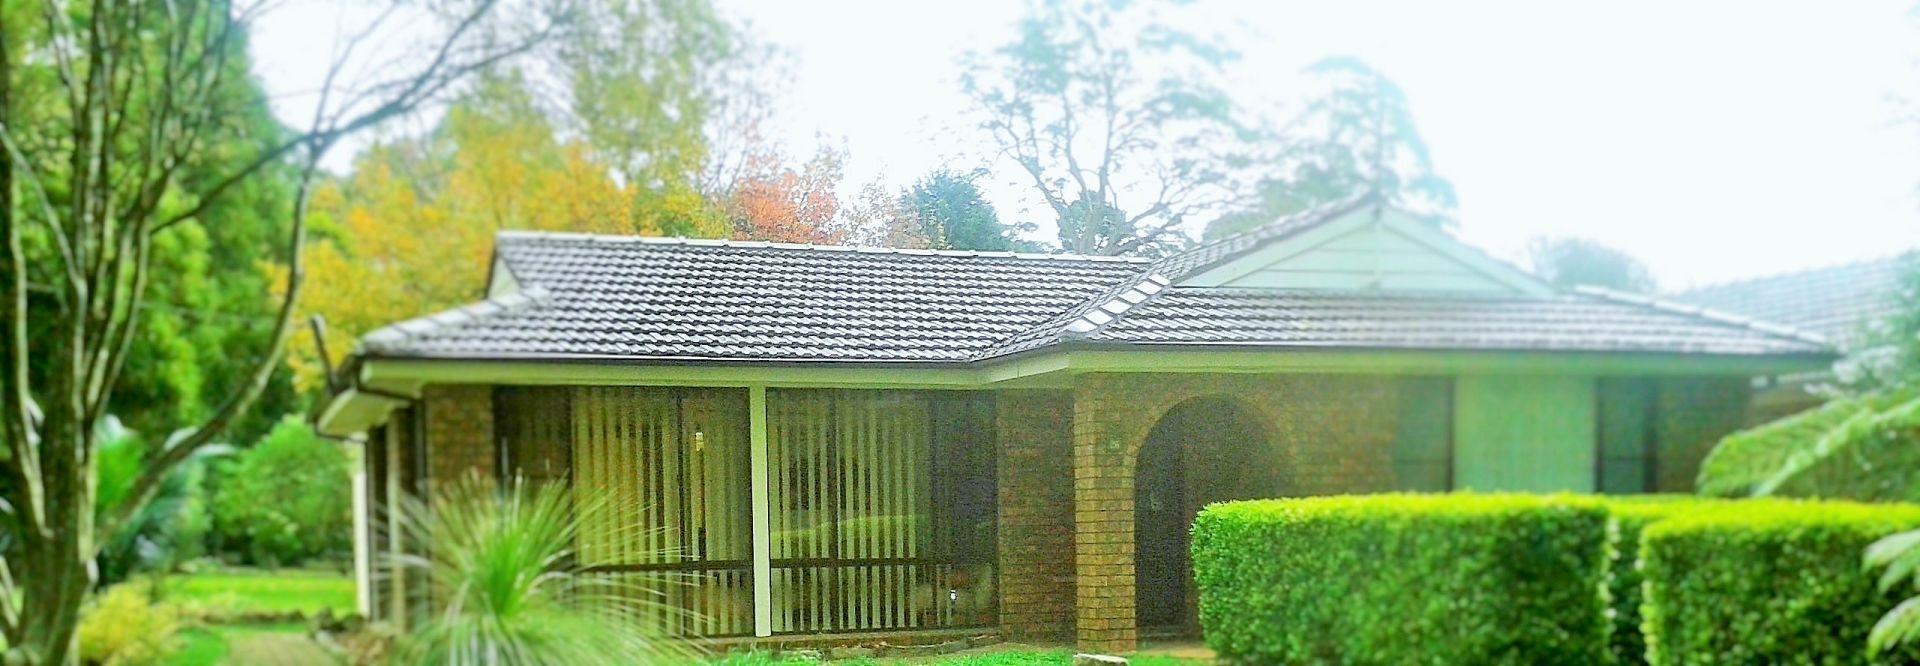 25 Region St, Burrawang NSW 2577, Image 0